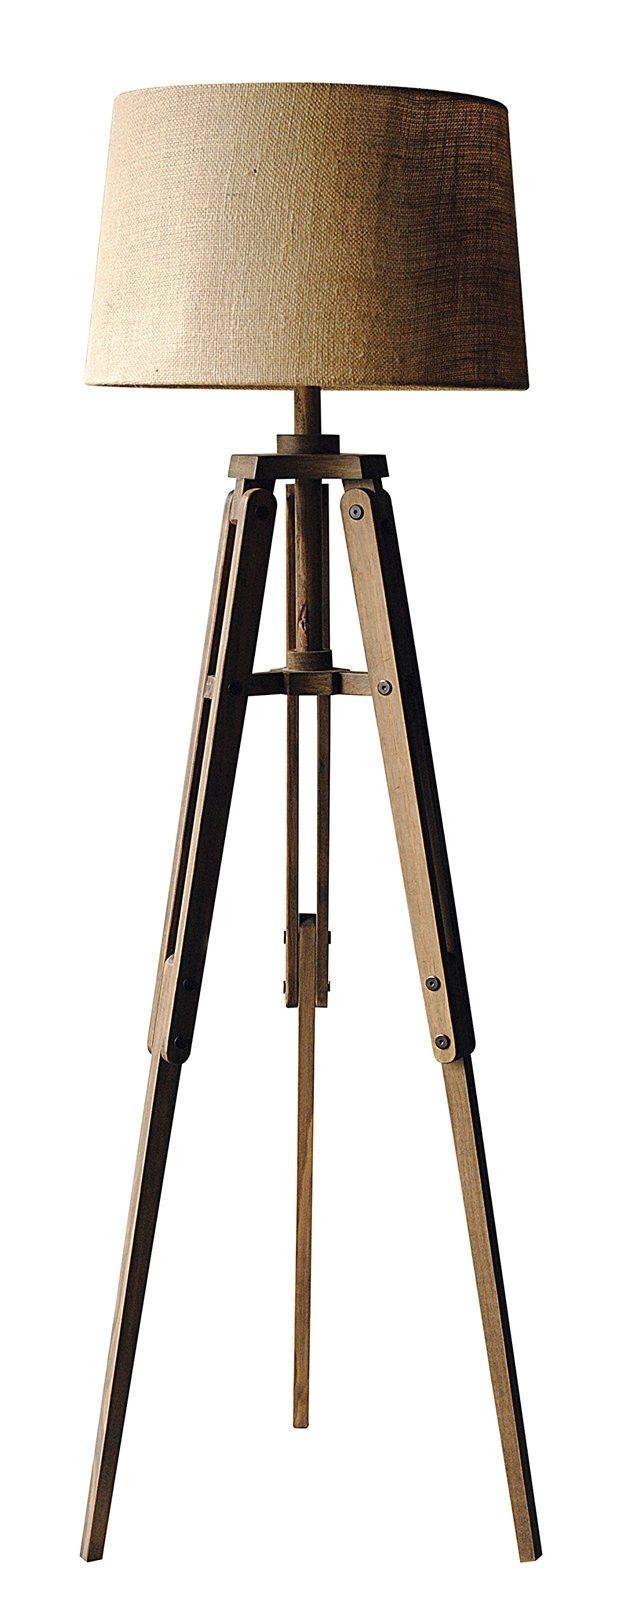 creative co op mariner wood tripod floor lamp with shade 62 25 height